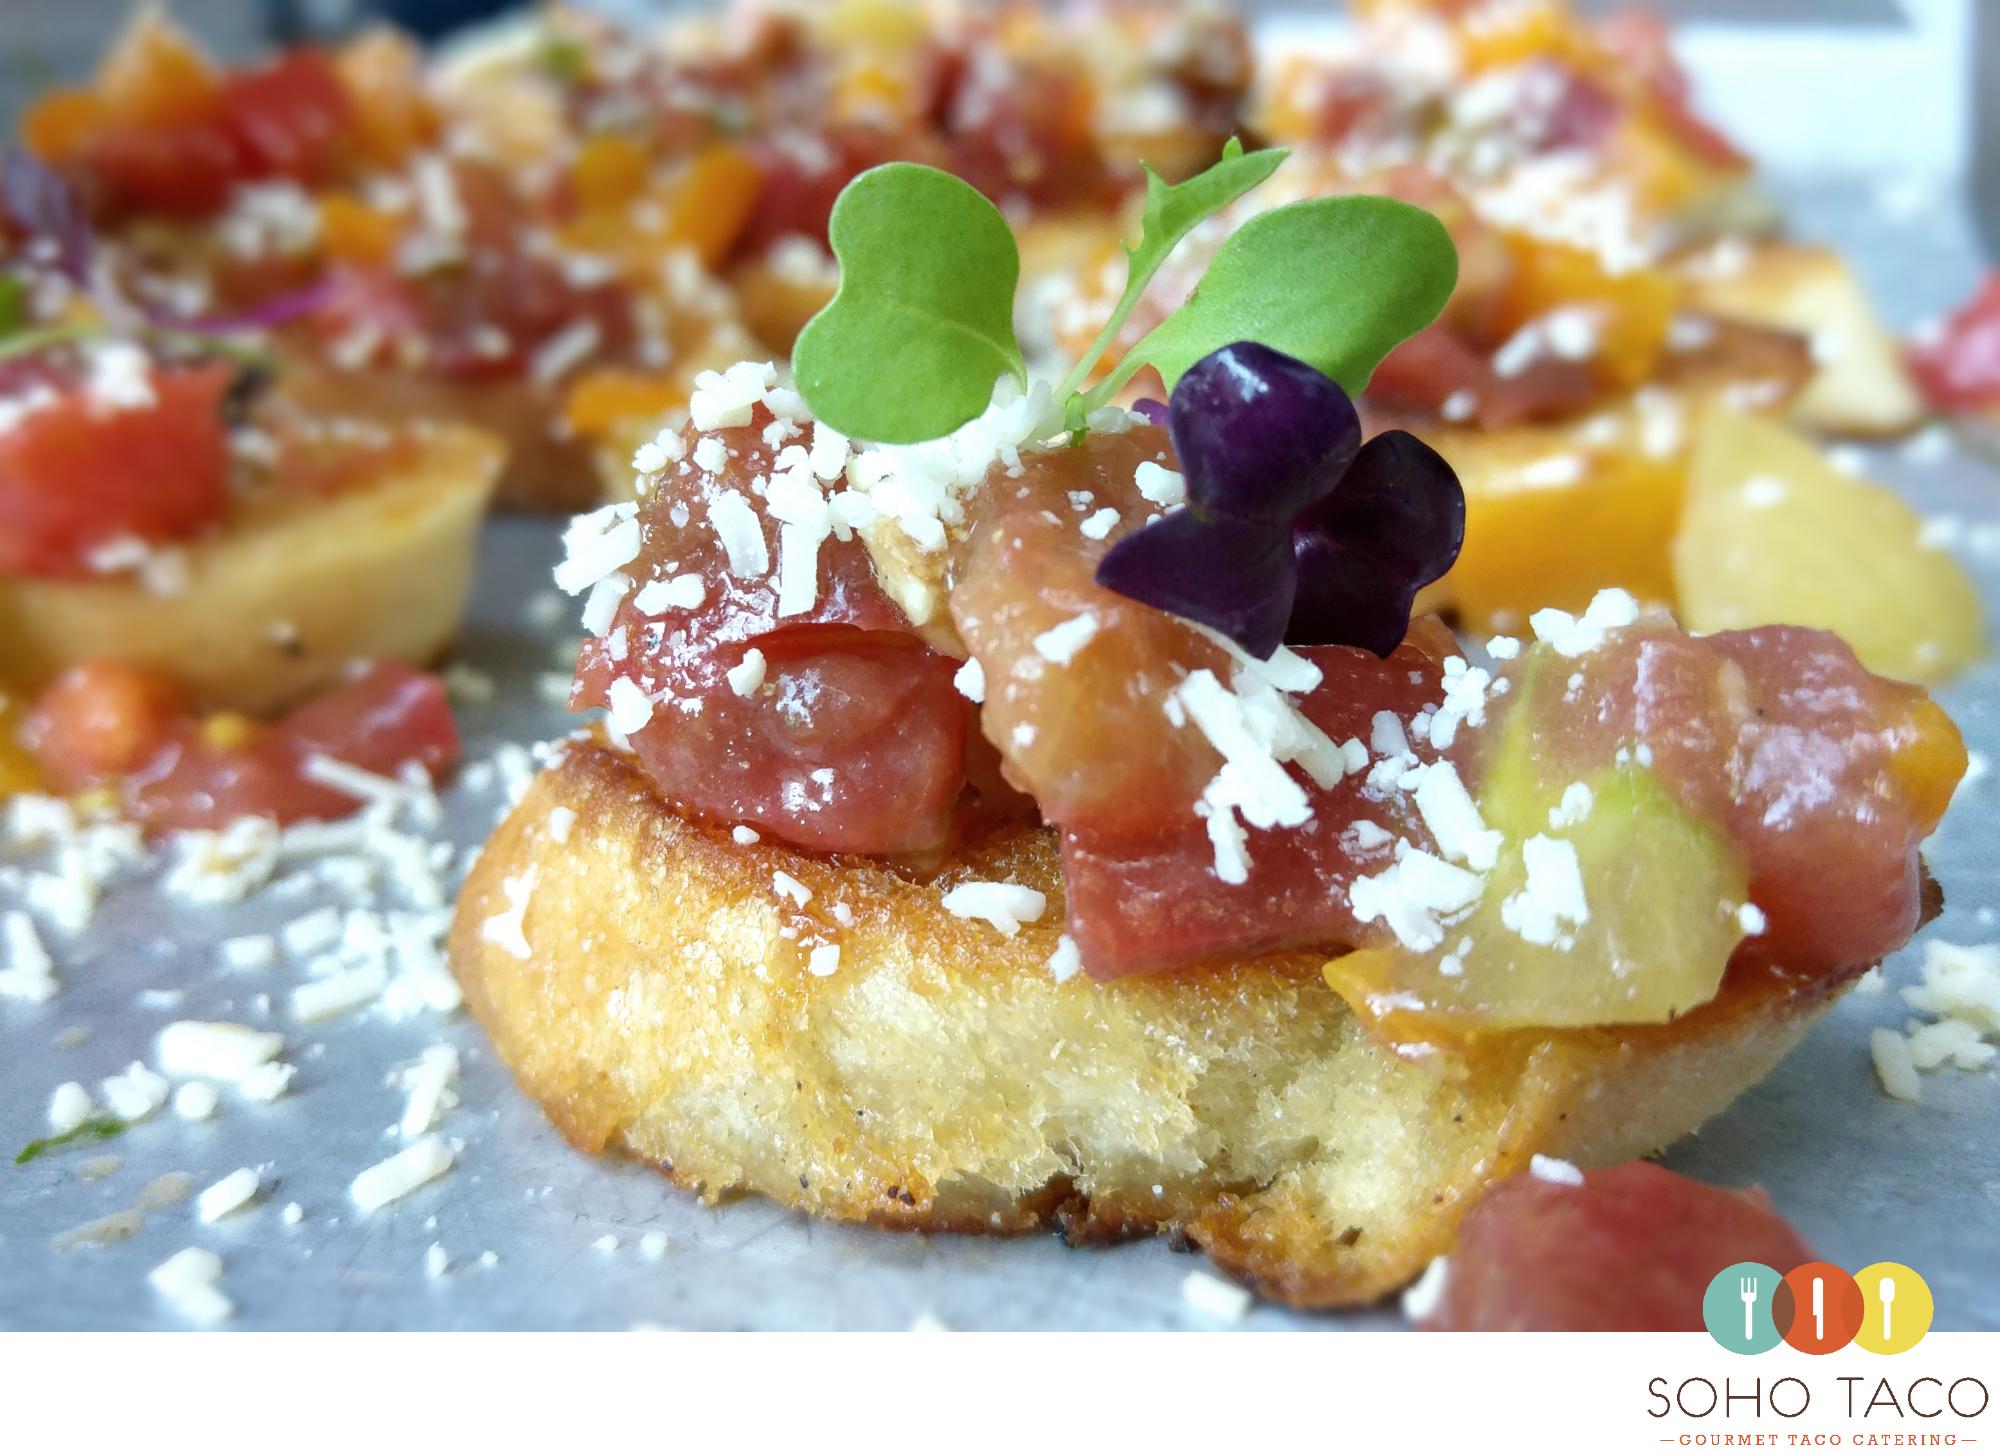 SOHO TACO Gourmet Taco Catering - Santa Ynez - Wedding - Brander Vineyard - Rebanadas de Tomates